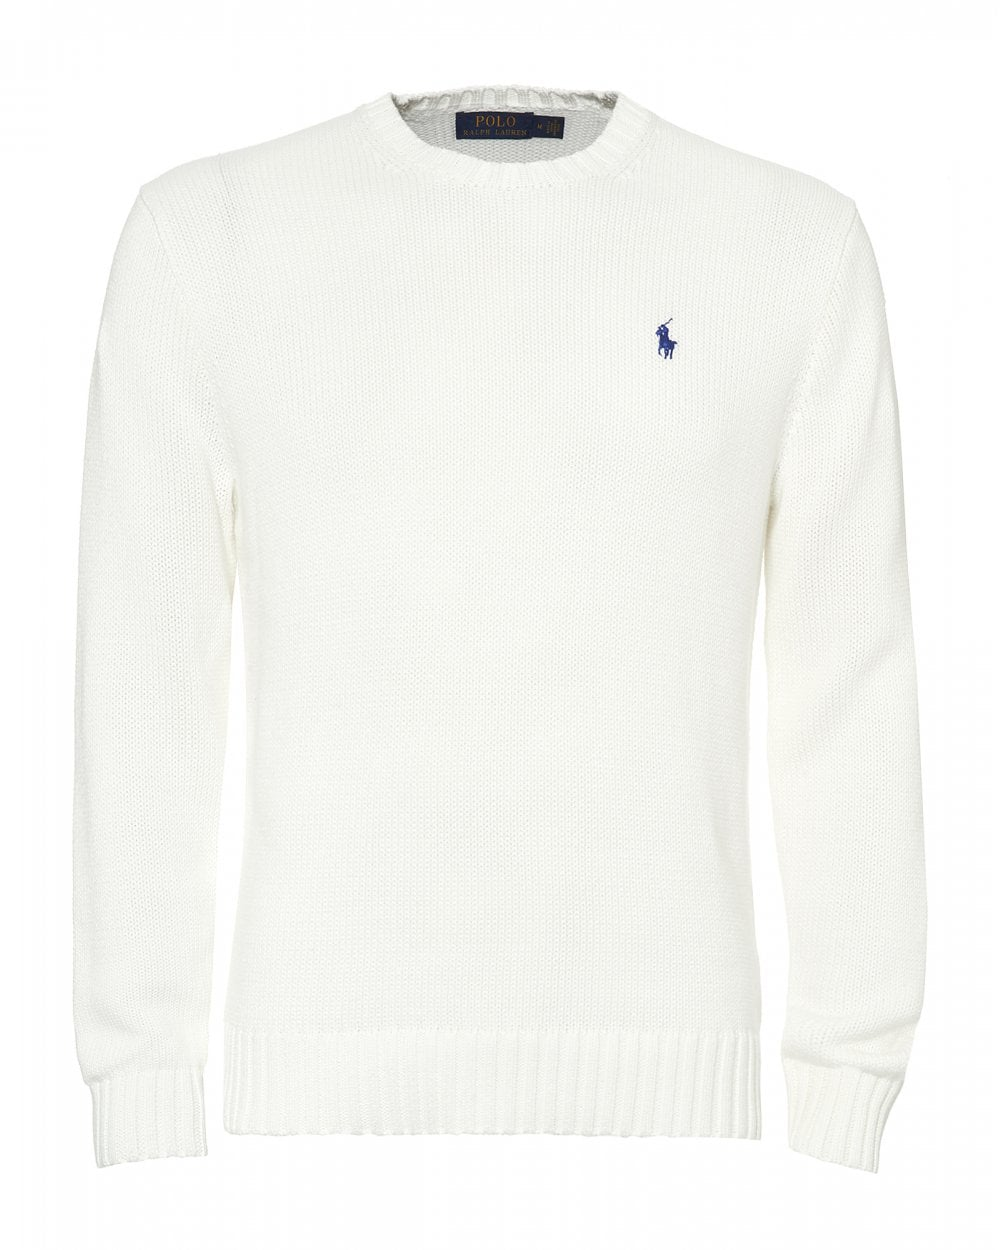 e9b33fc54c75 Ralph Lauren Mens Crew Neck Jumper, White Sweater